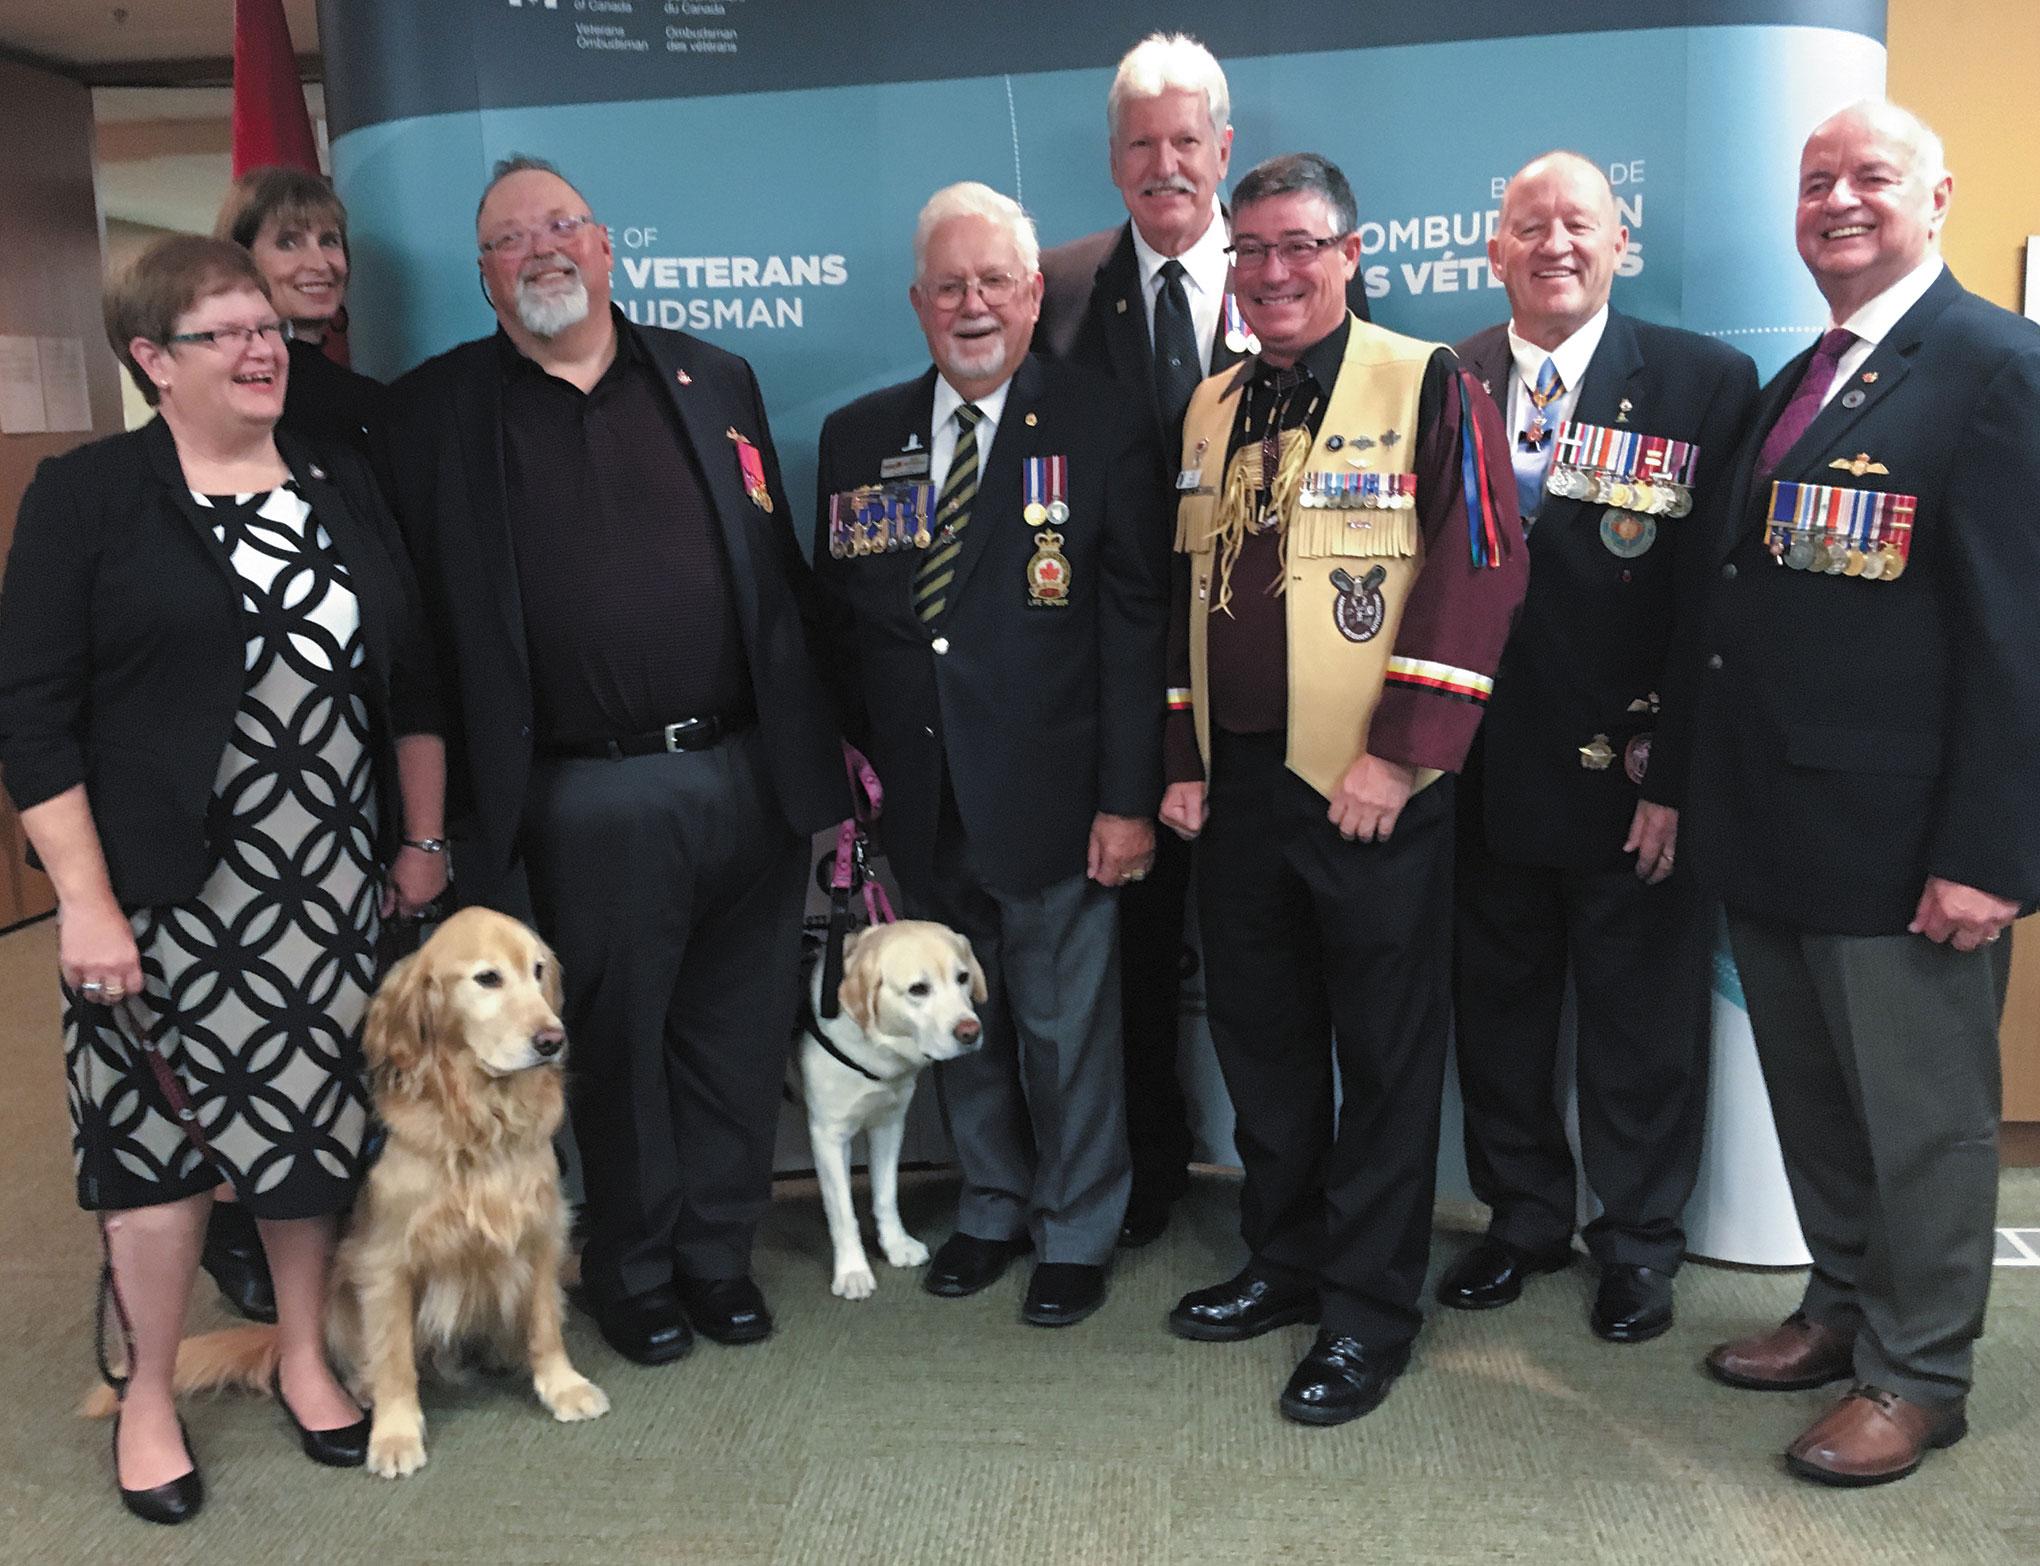 Veterans Ombudsman, Guy Parent, and Deputy Veterans Ombudsman, Sharon Squire, with the 2017 Veterans Ombudsman Commendation recipients